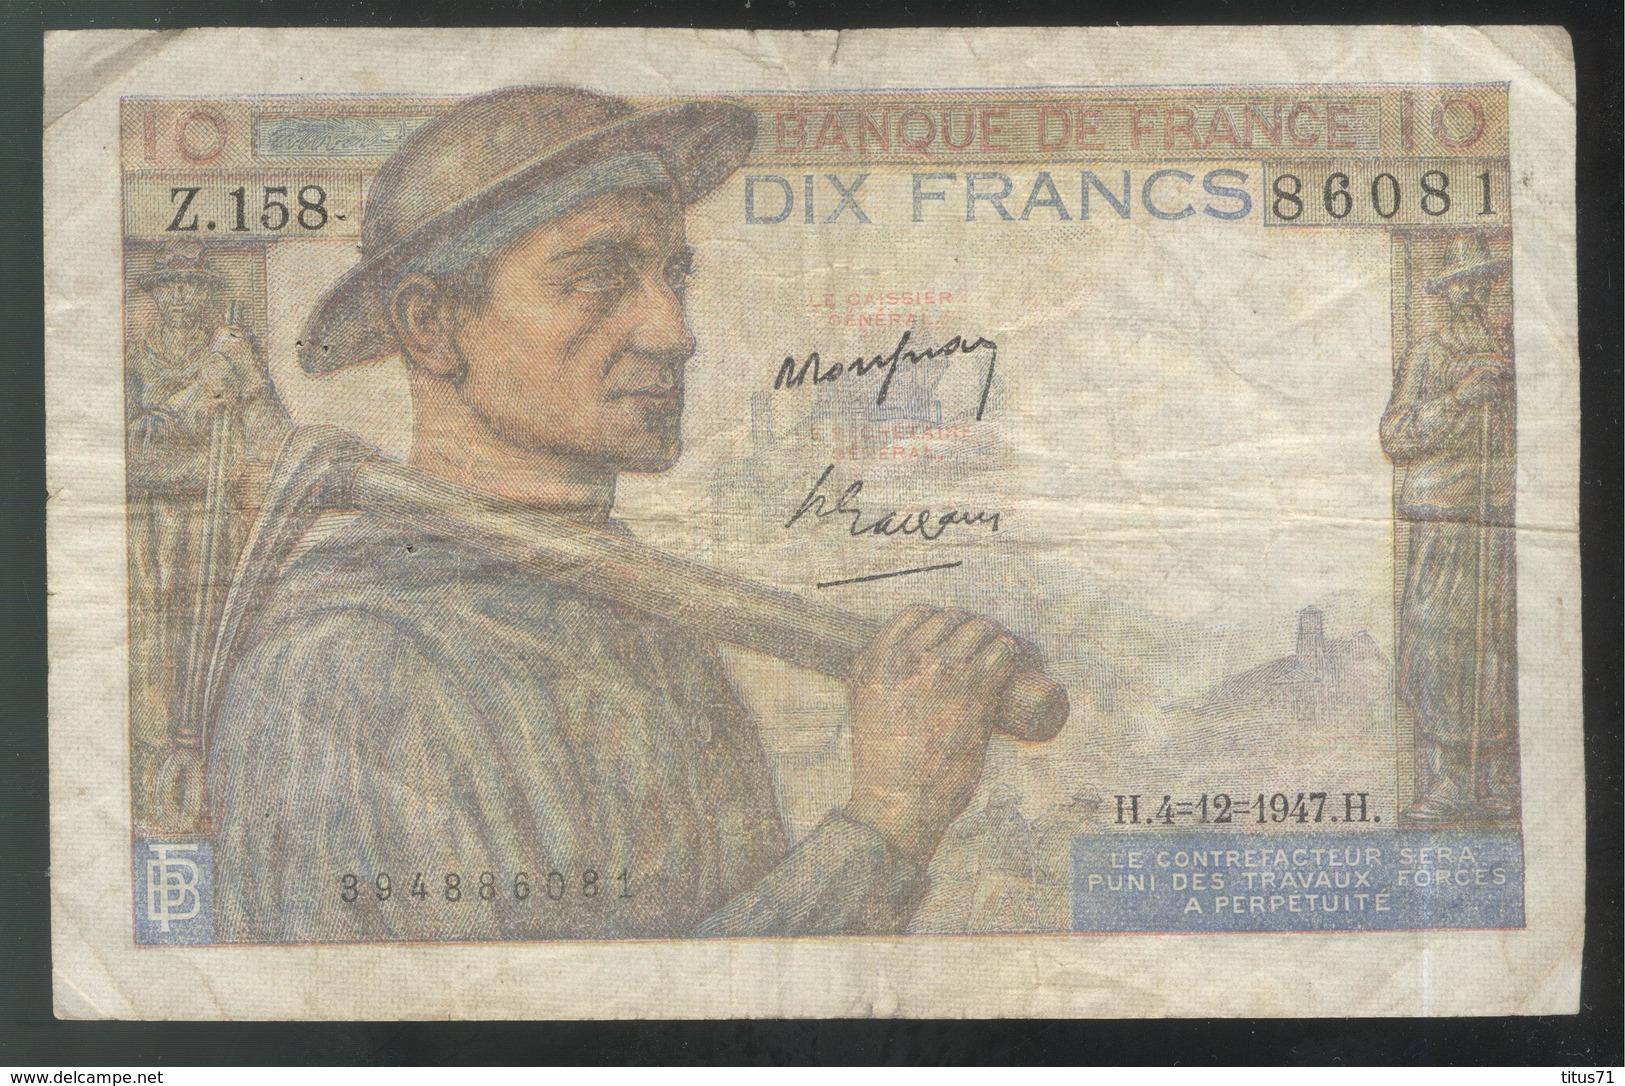 Billet 10 Francs France Mineur 4-12-1947 Bon état - 1871-1952 Circulated During XXth